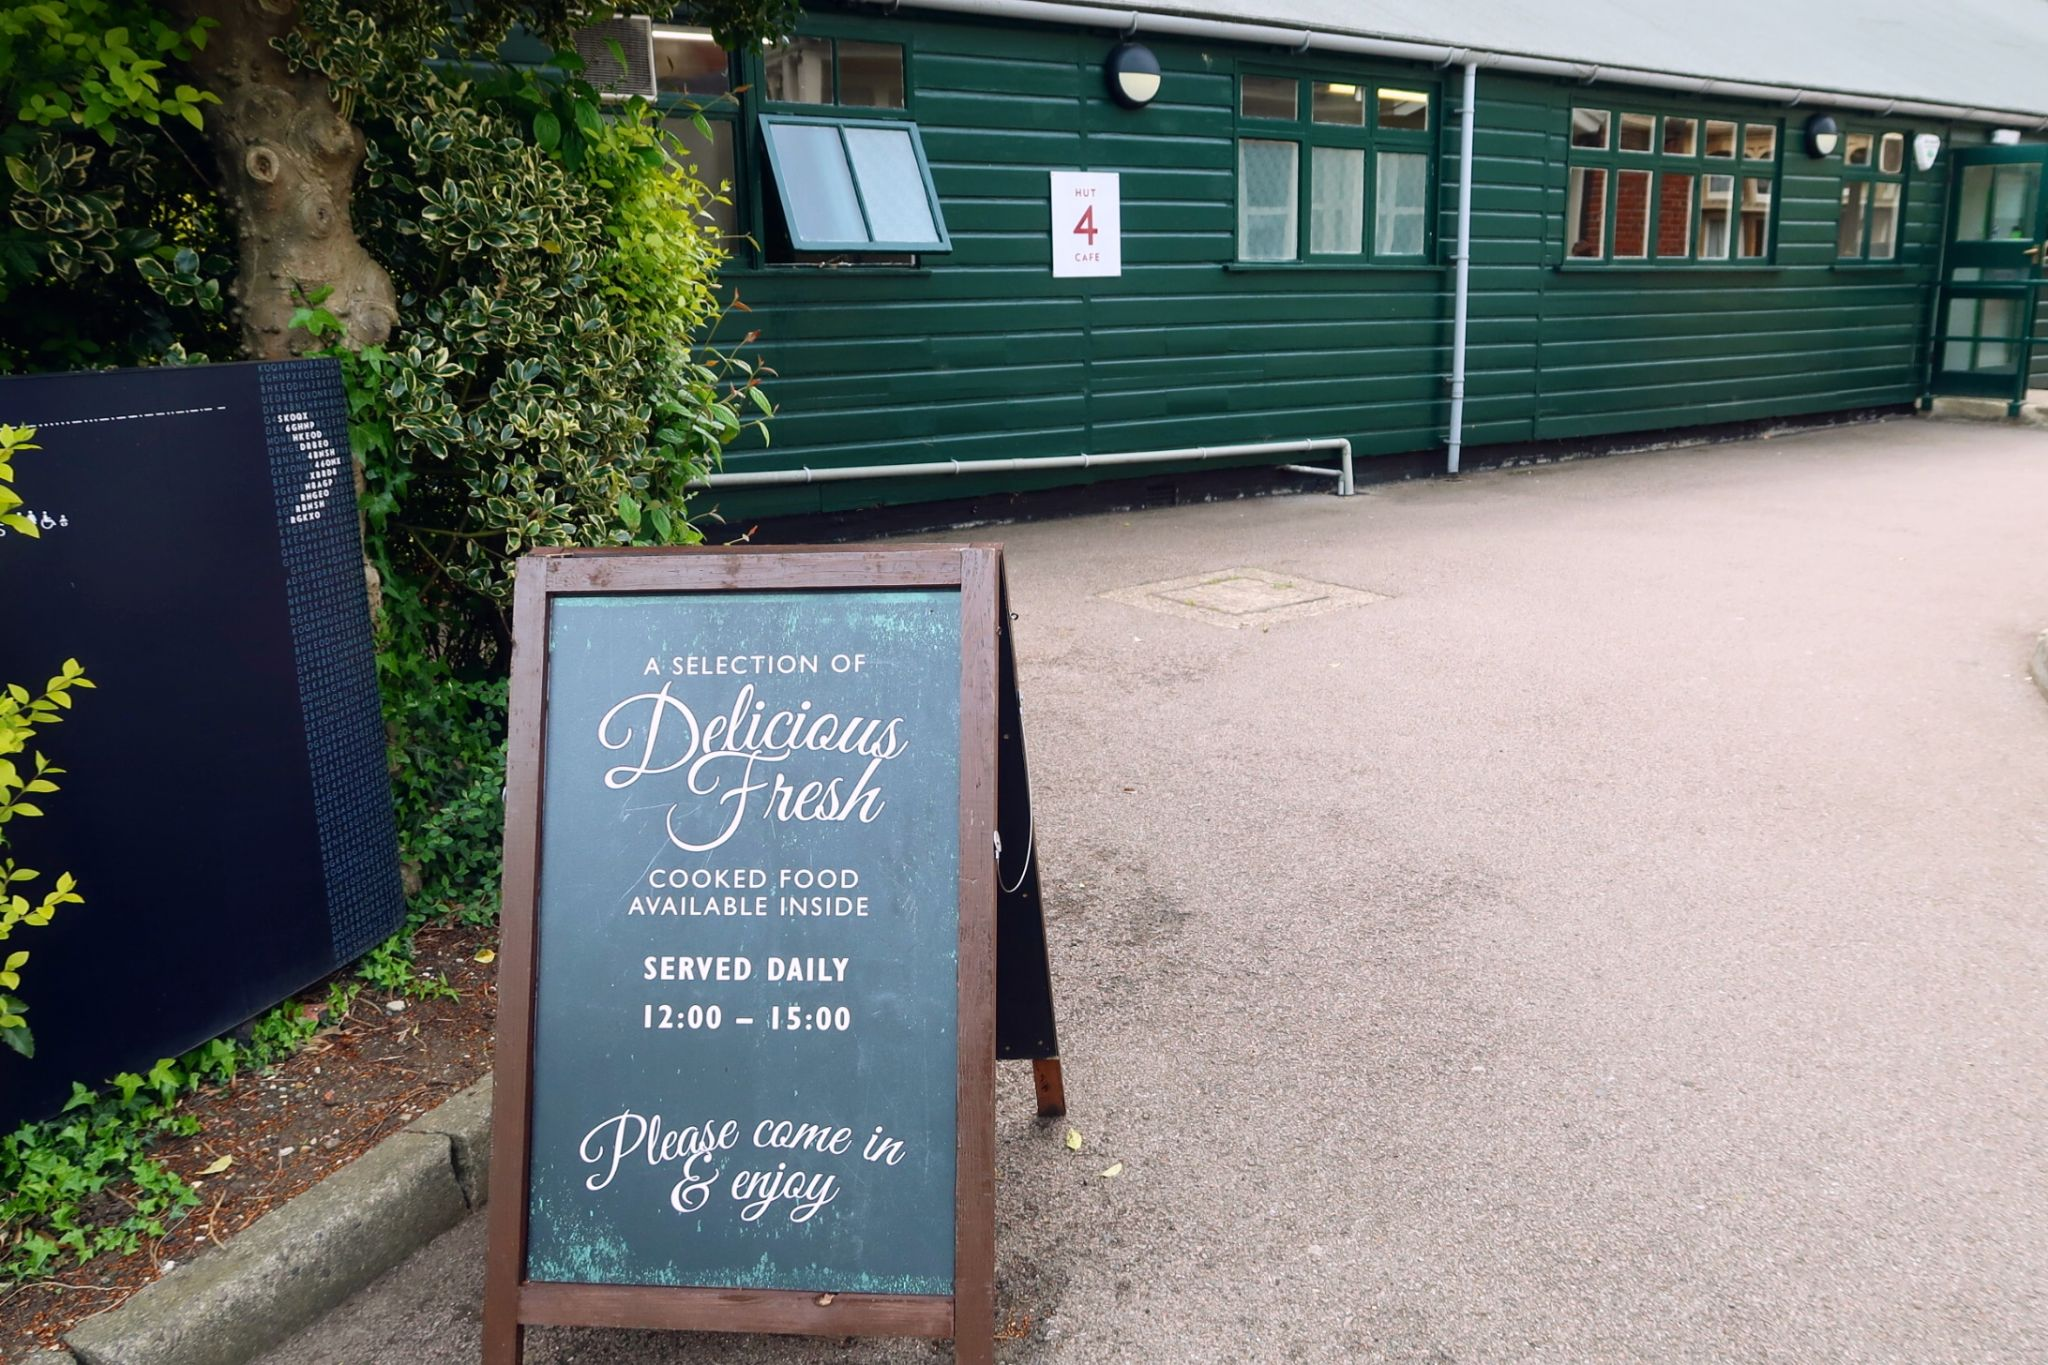 Bletchley Park Museum Hut 4 cafe exterior CREDIT_ © Minka Guides